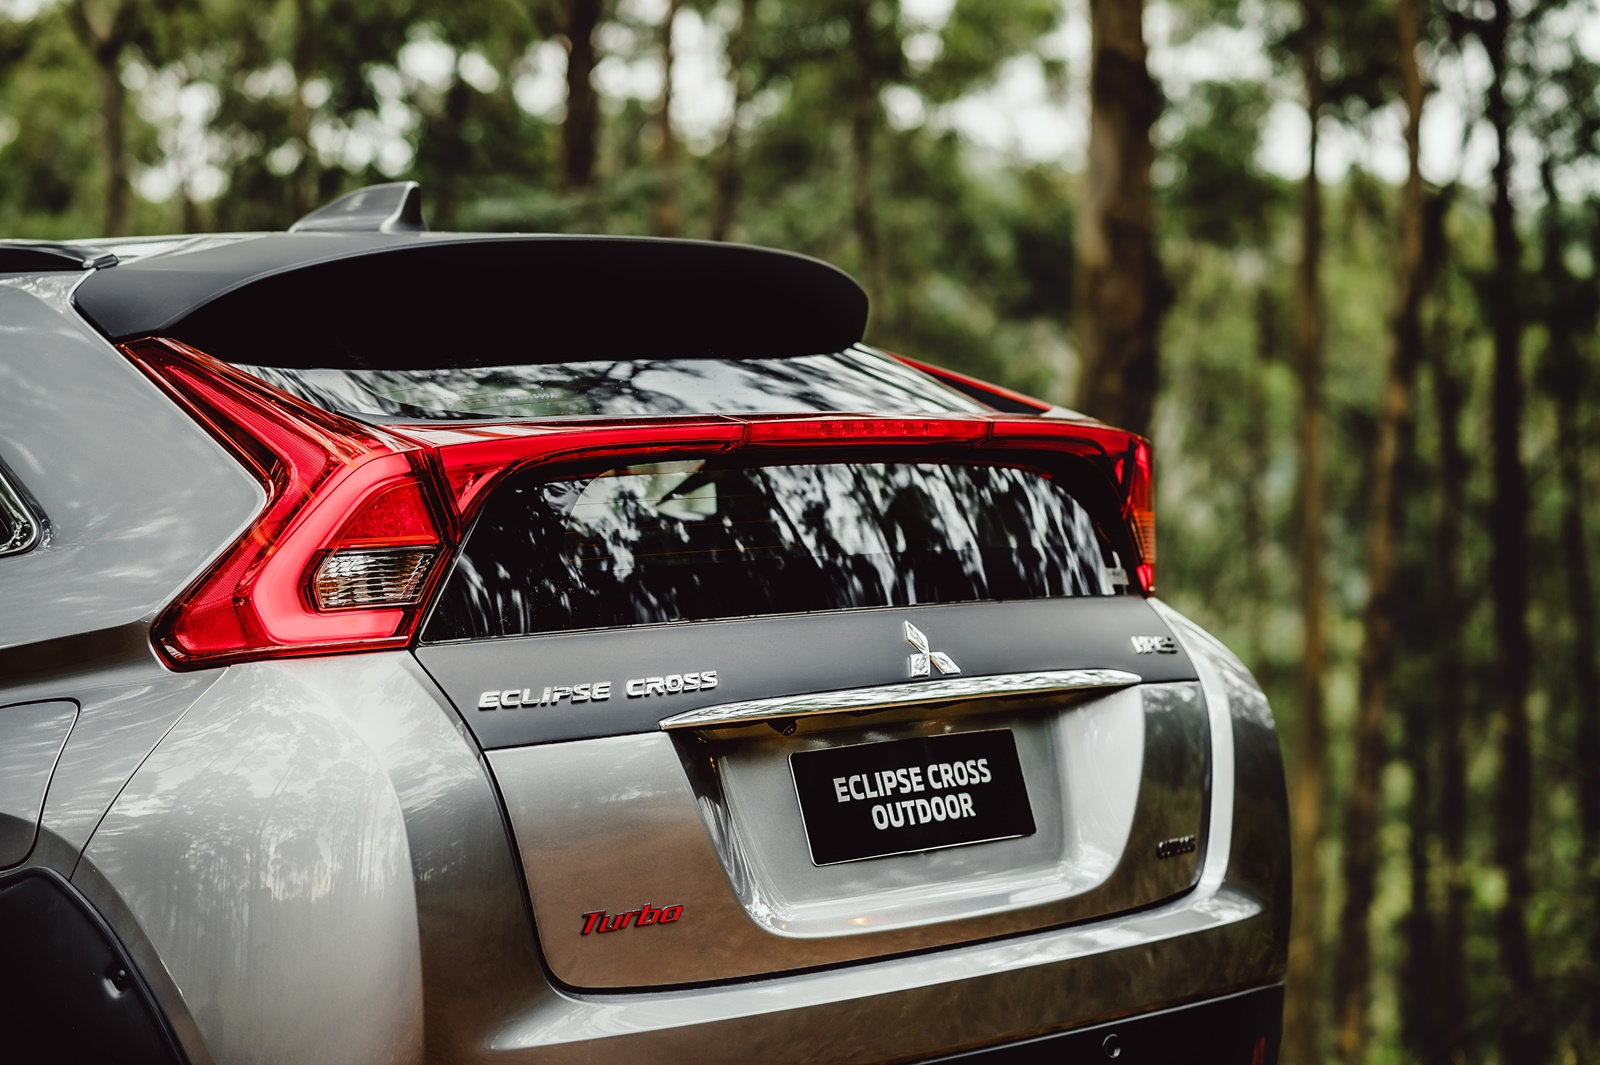 Mitsubishi Eclipse Cross Outdoor 8